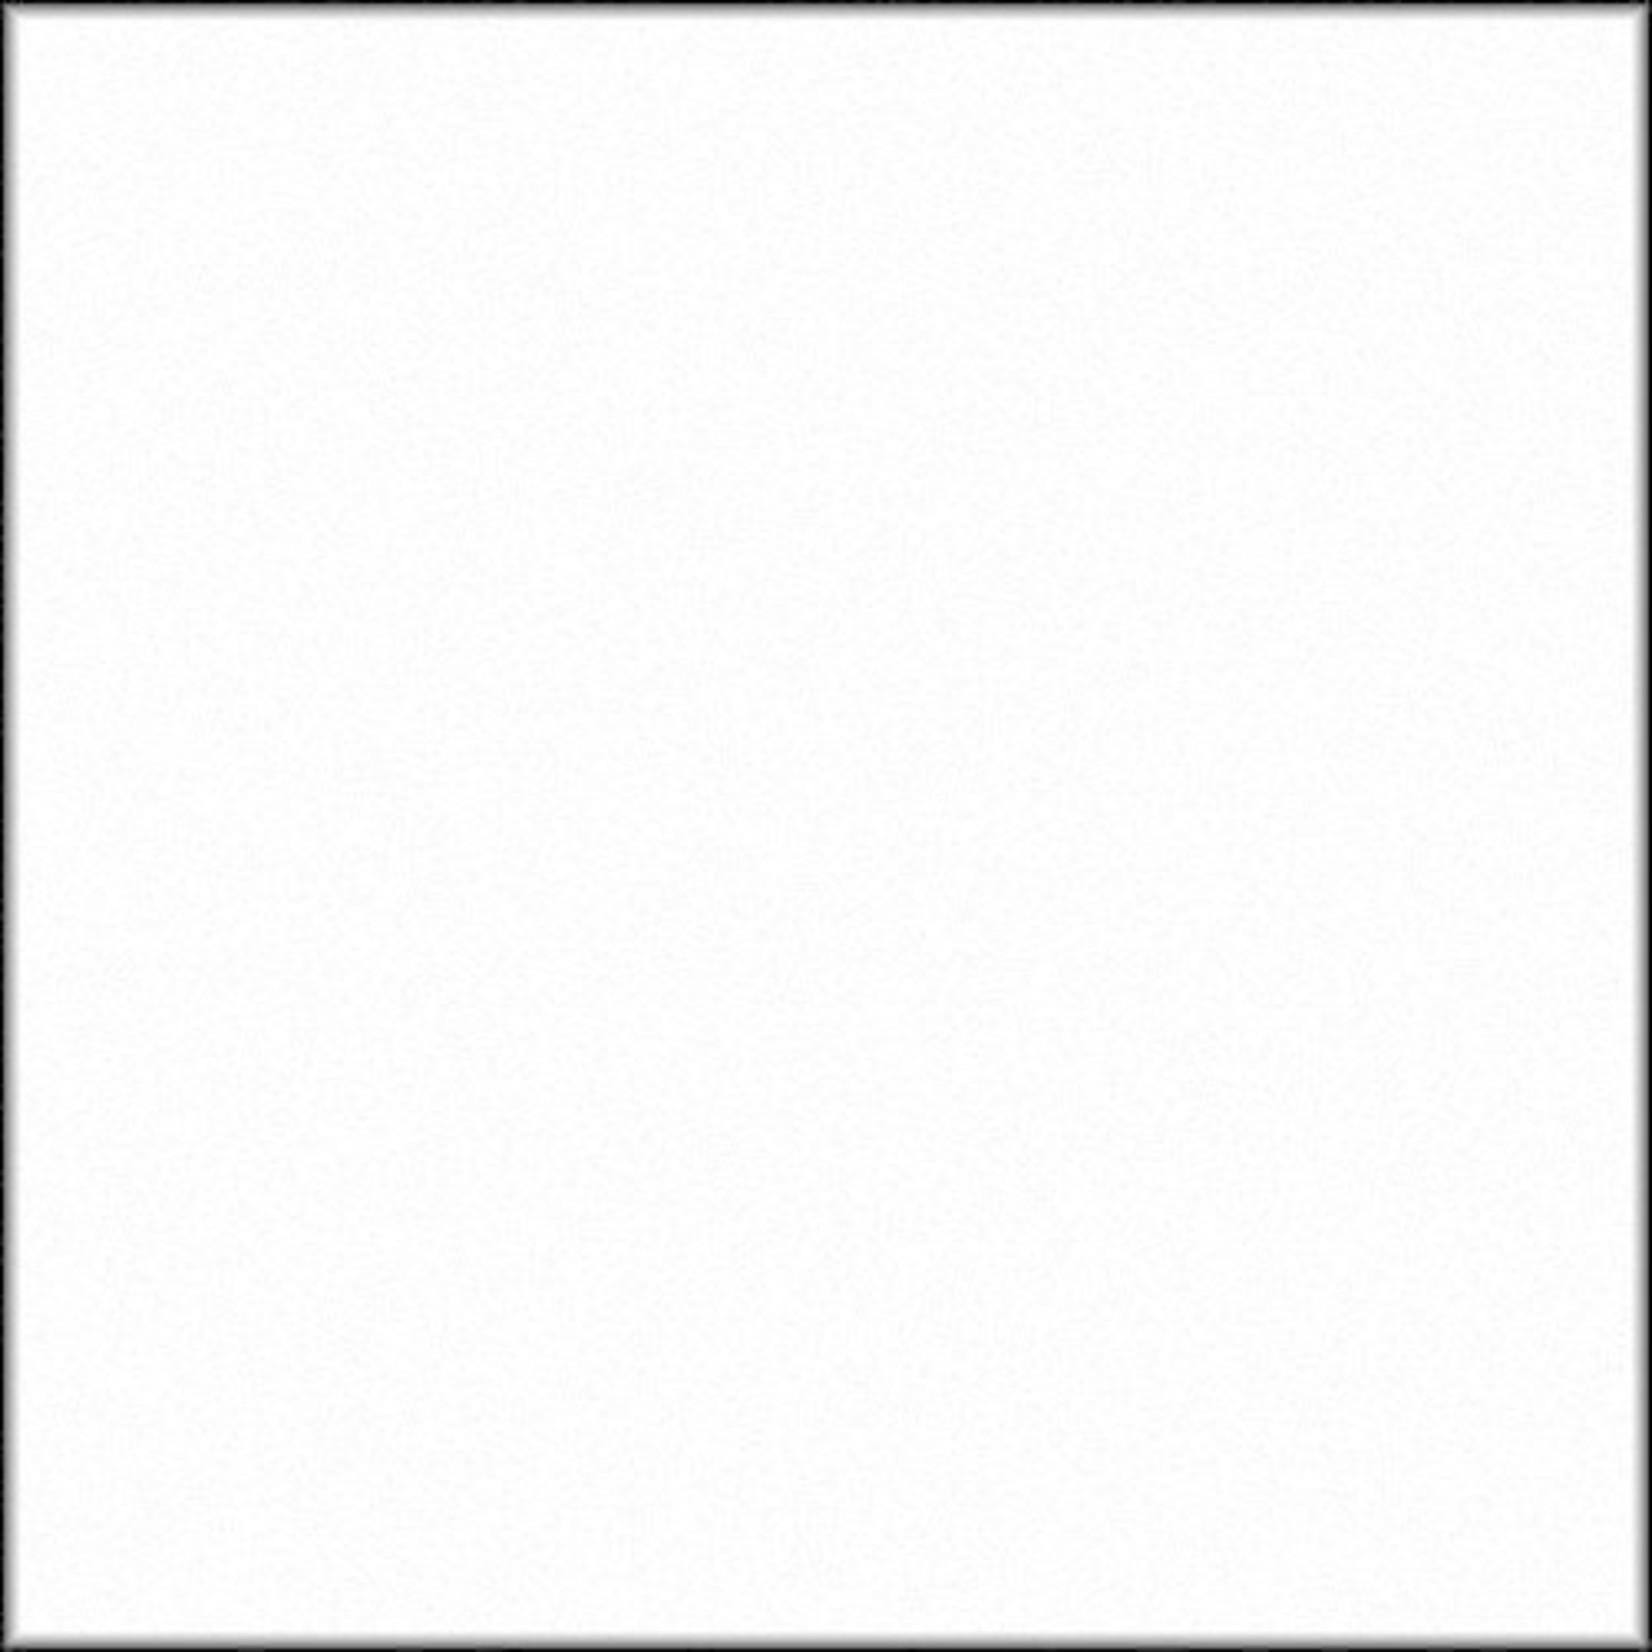 "Rosco Rosco Roscolux #116 Filter - Tough White Diffusion - 20x24"" Sheet"